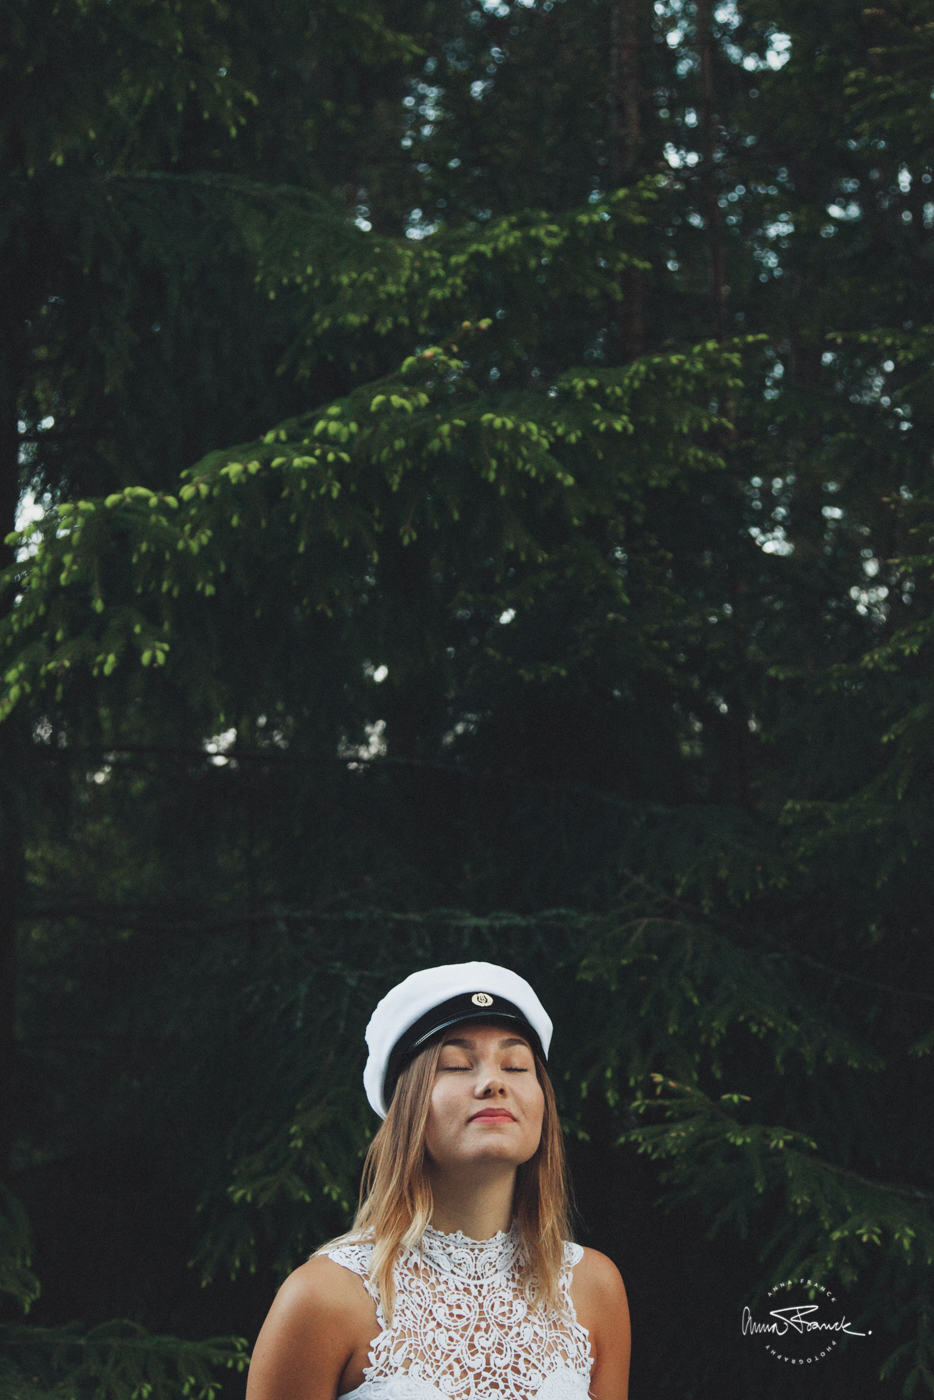 graduation, studentfoto, ylioppilaskuva, valokuvaus, anna, franck, pargas, parainen, stockholm, sverige, finland, forest, skog, natur, luonto